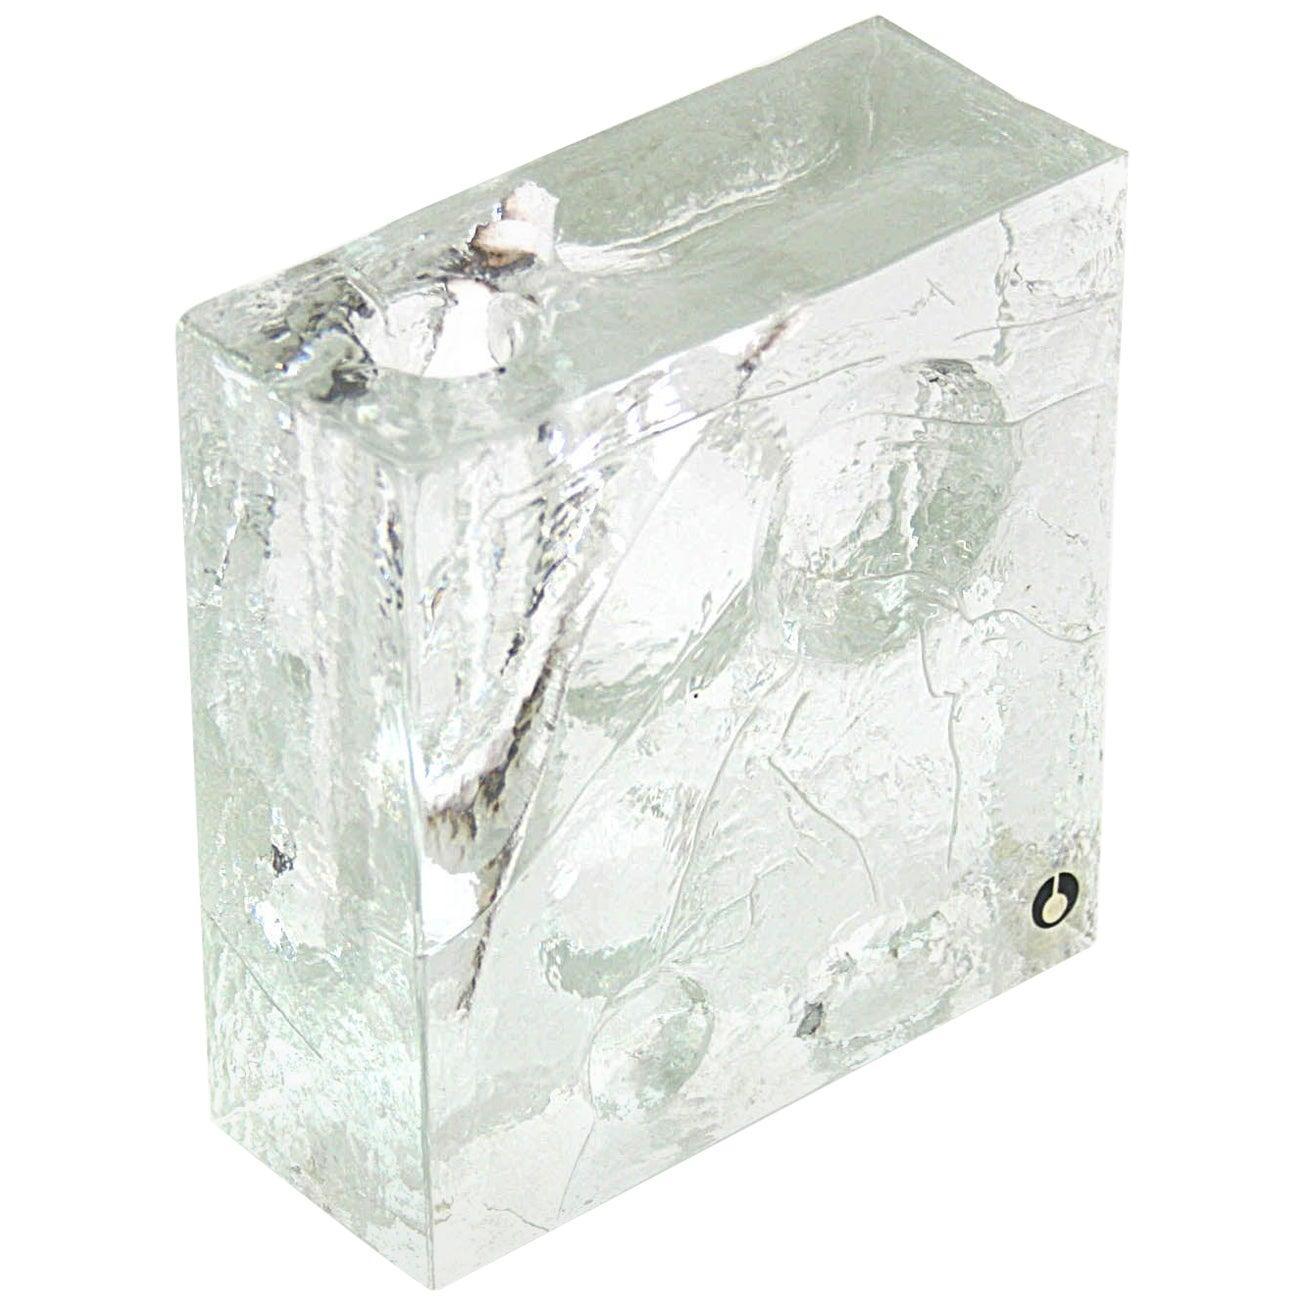 Vase Ice Glass Sculptured by Pukeberg